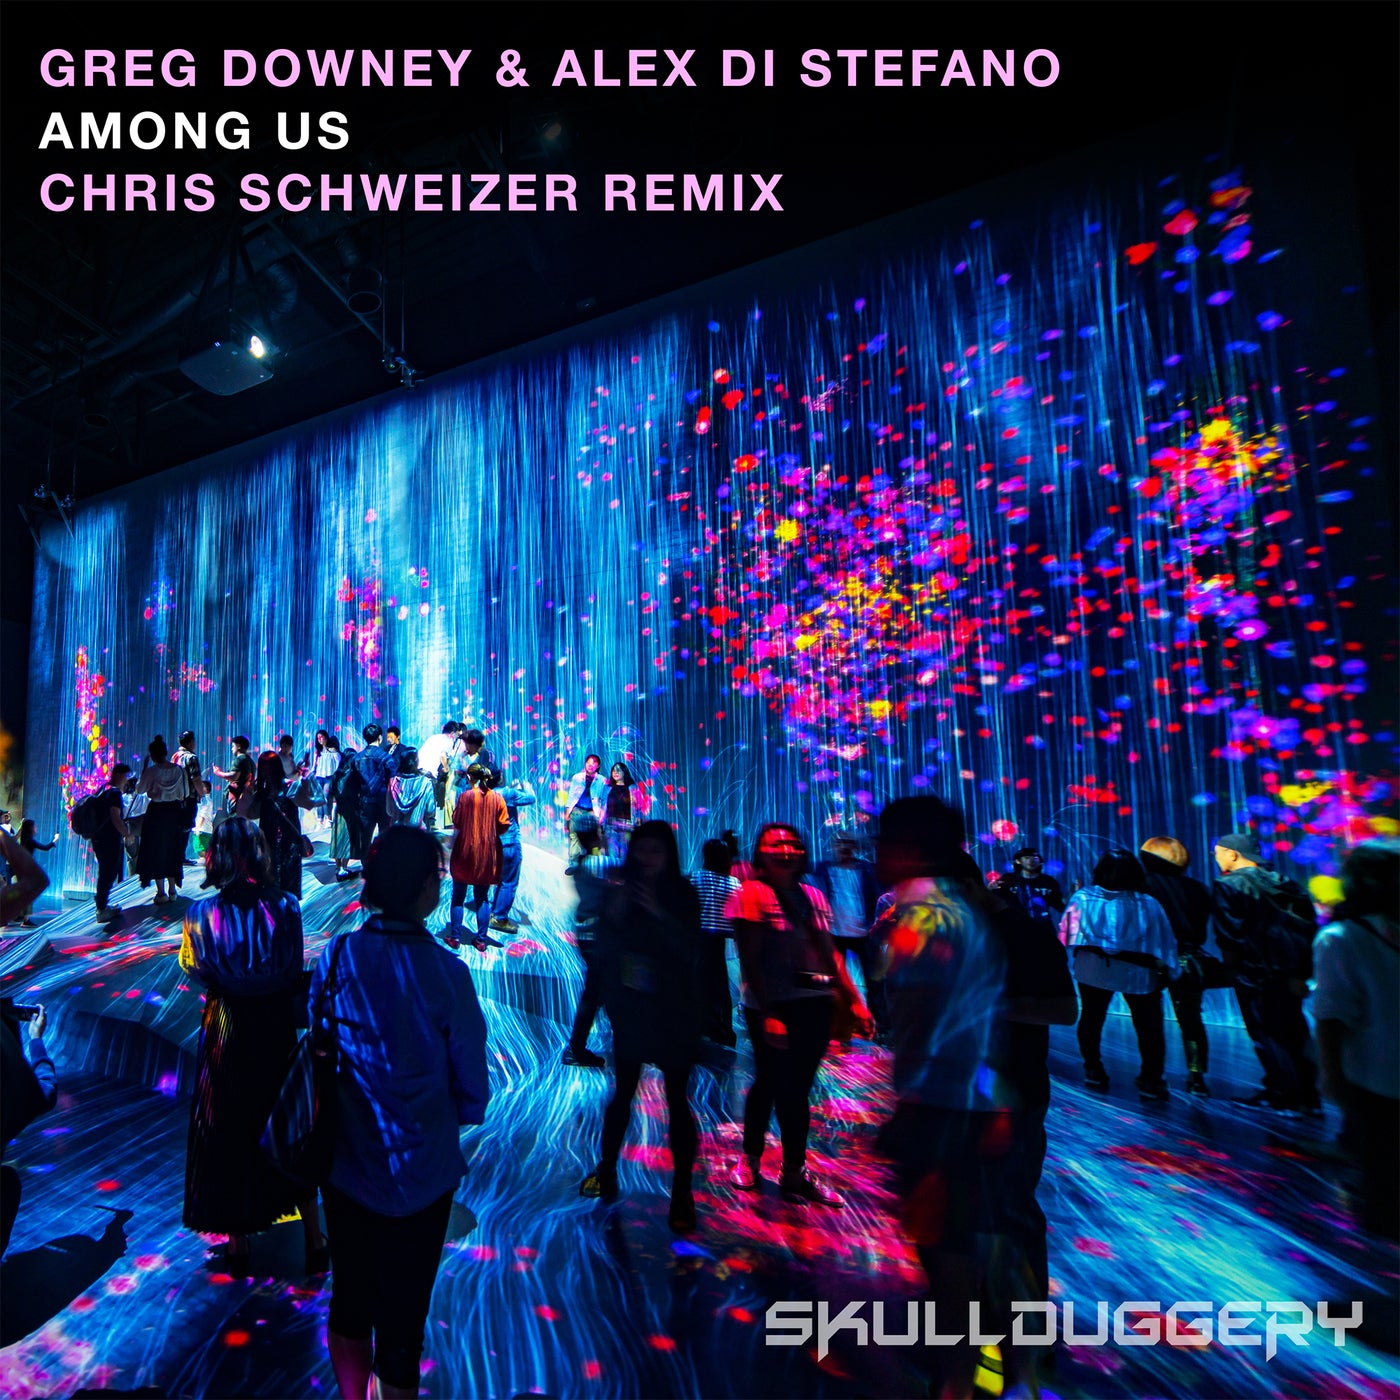 Among Us (Chris Schweizer Extended Remix)